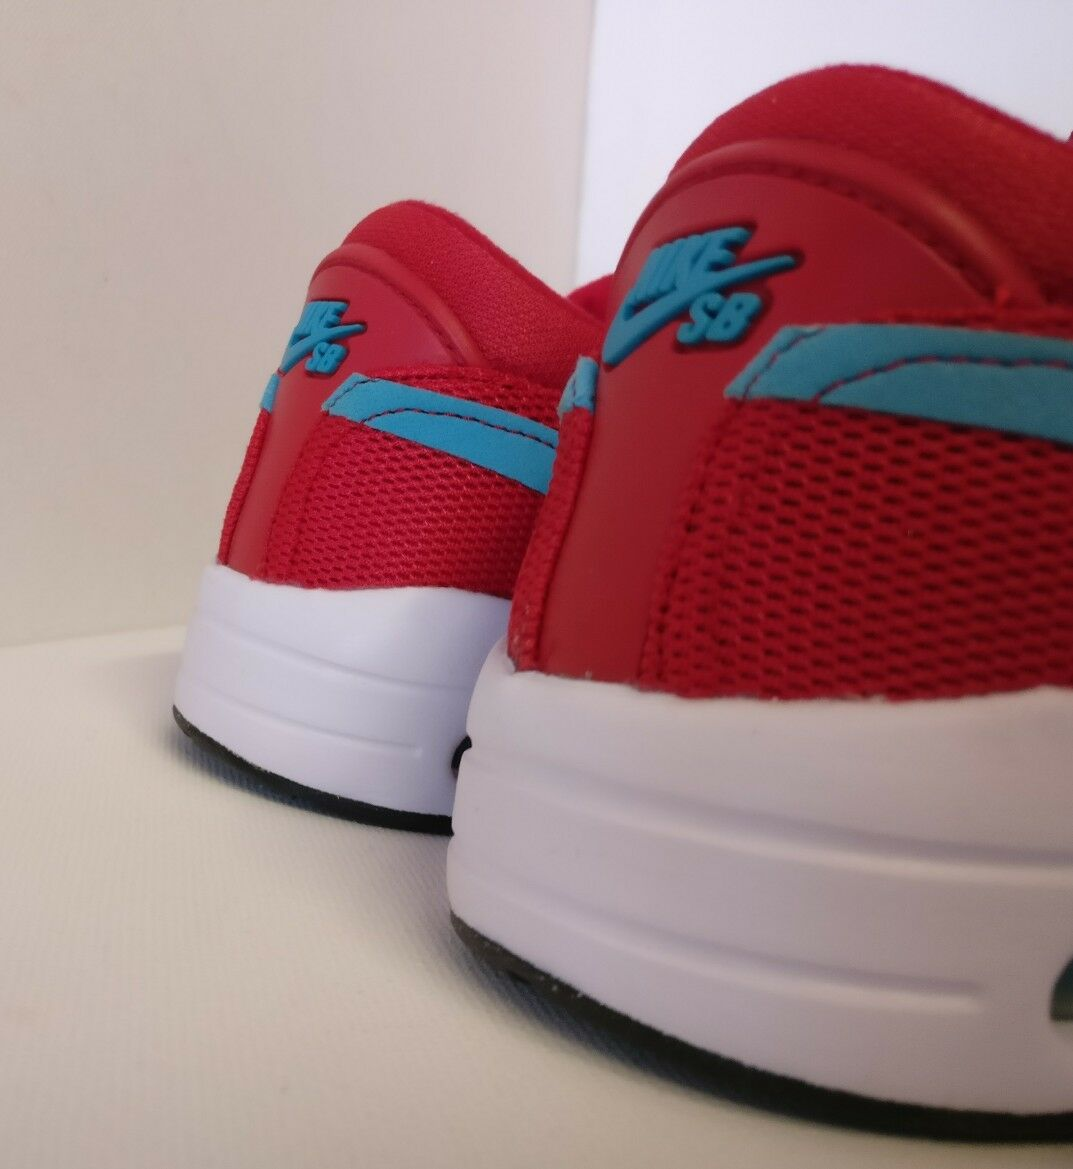 Nike SB Eric Koston Max OMG UK 5 University ROT OMG Max Blau Weiß 833446641 779d50